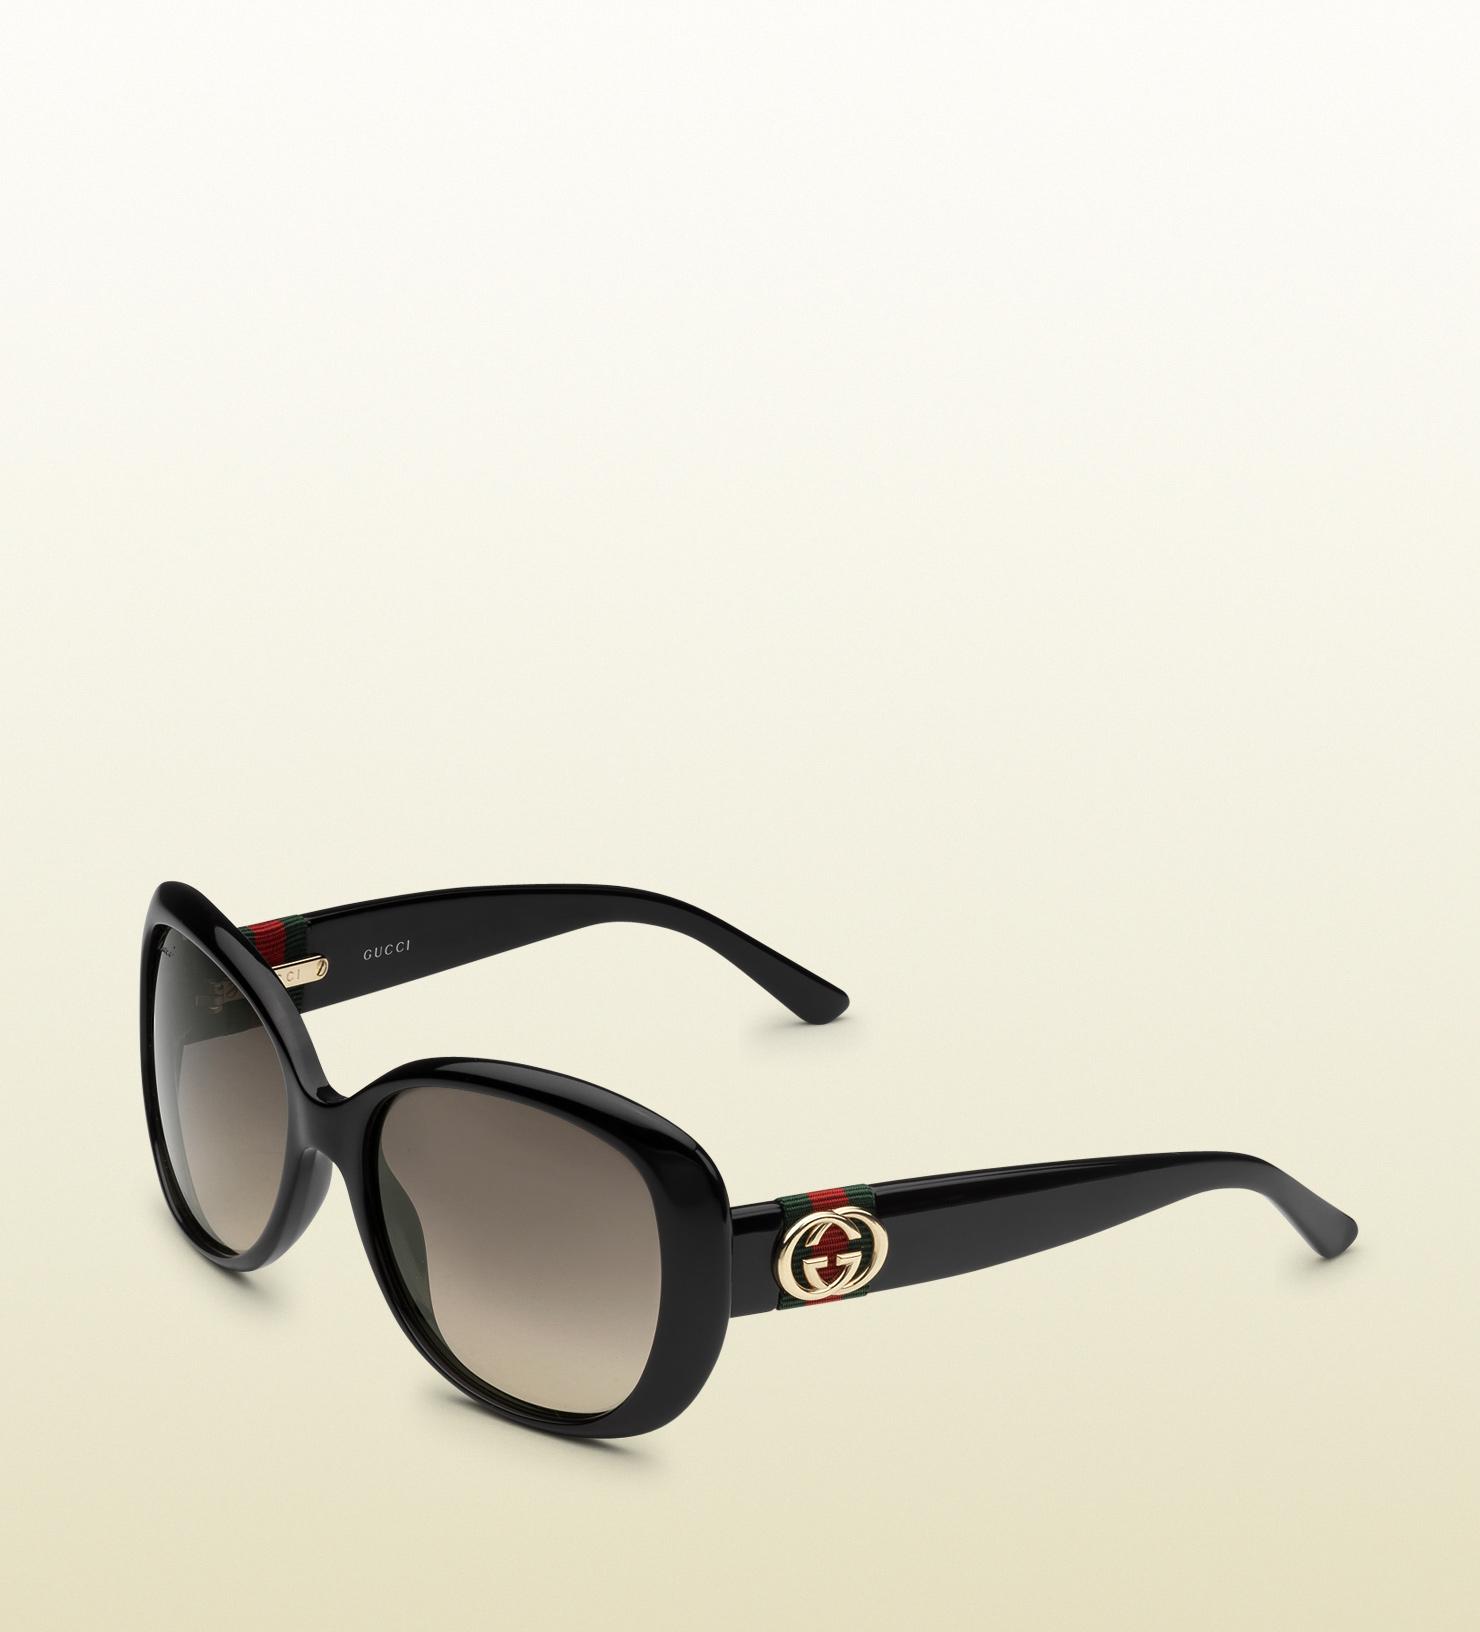 d38097db6d5ed Gucci Shiny Black Oversize Contrast Sunglasses in Black - Lyst